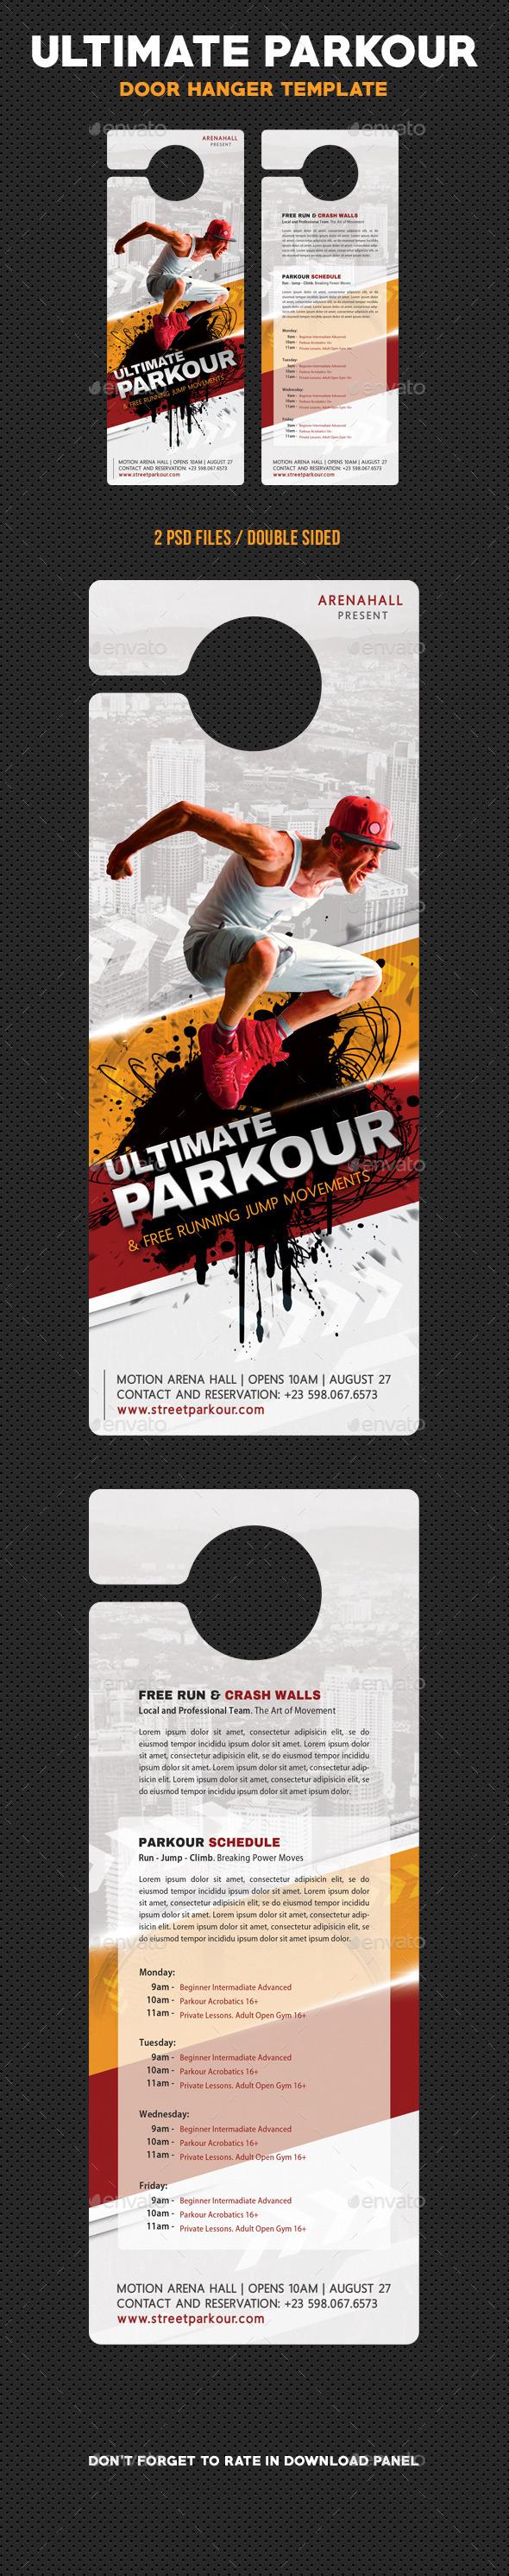 Ultimate Parkour Free Running Door Hanger - Miscellaneous Print Templates